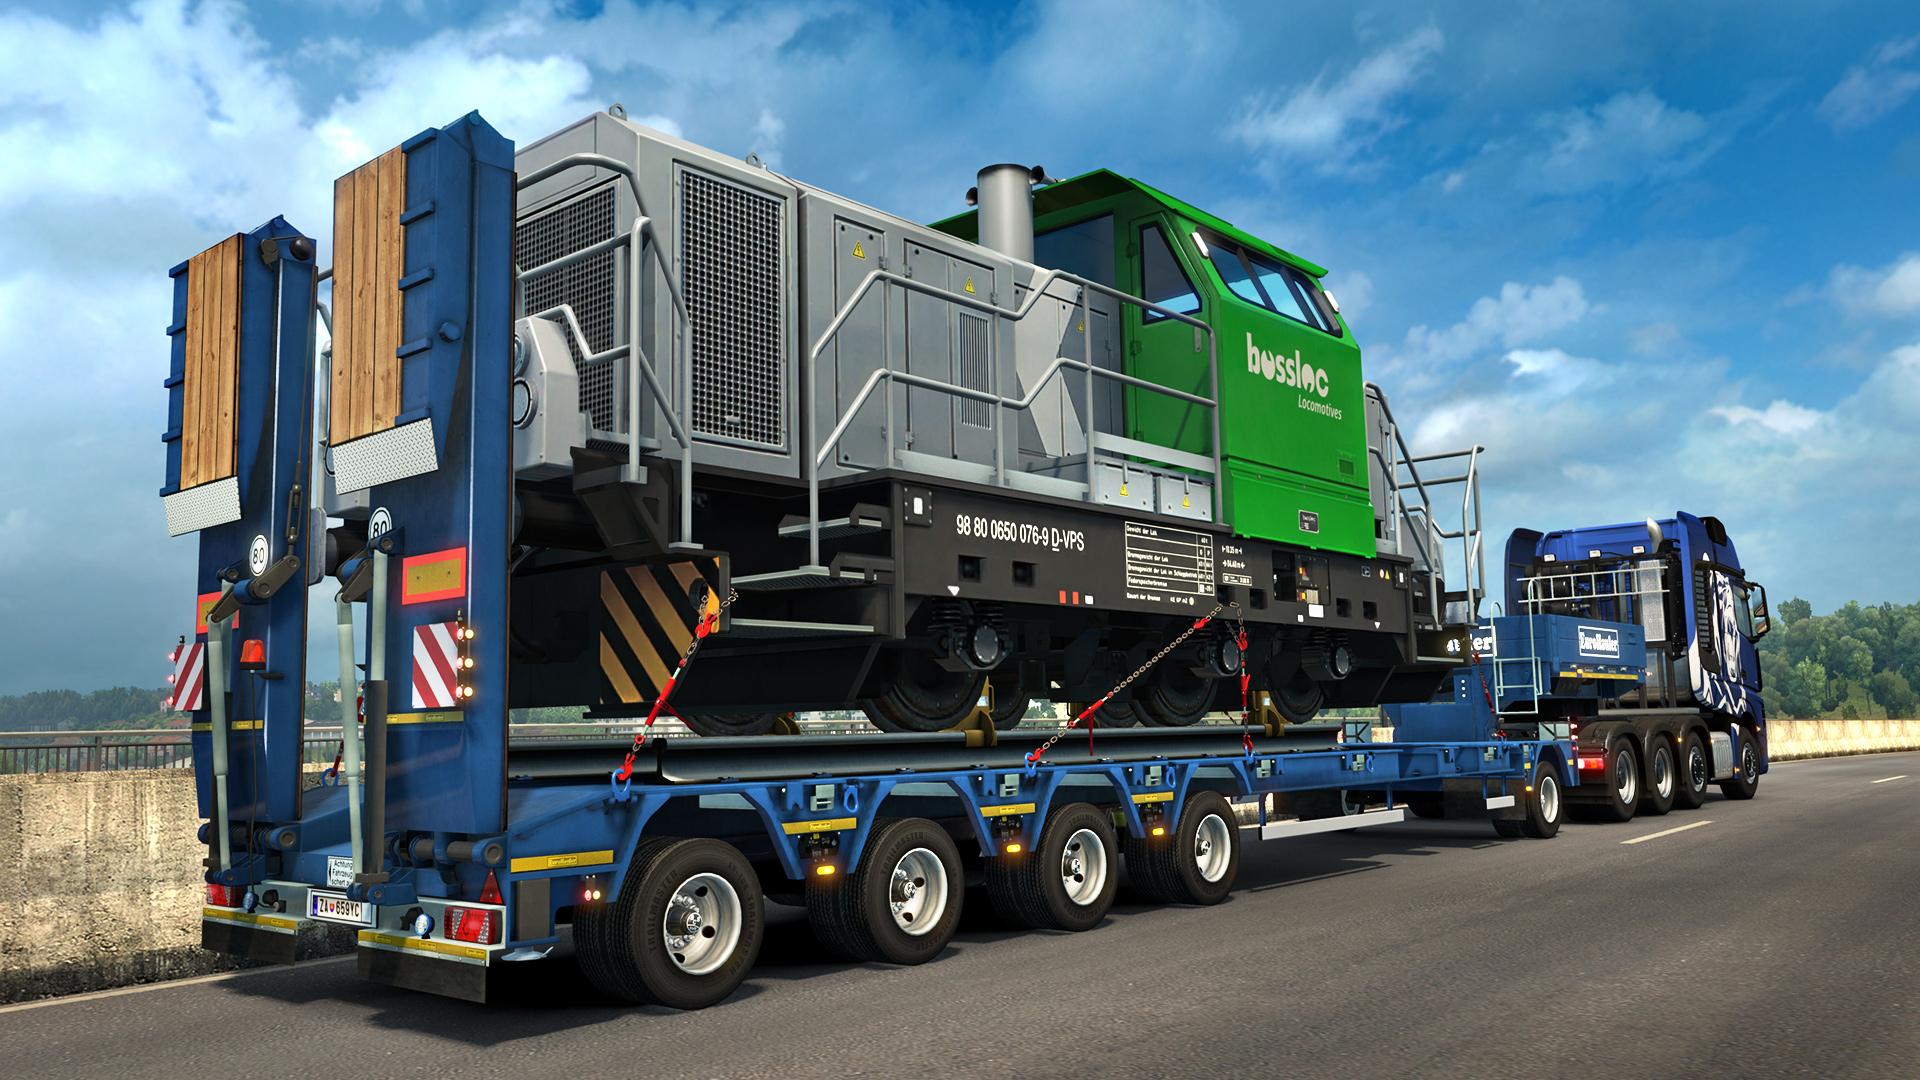 euro truck simulator 2 heavy cargo pack dlc download updated. Black Bedroom Furniture Sets. Home Design Ideas